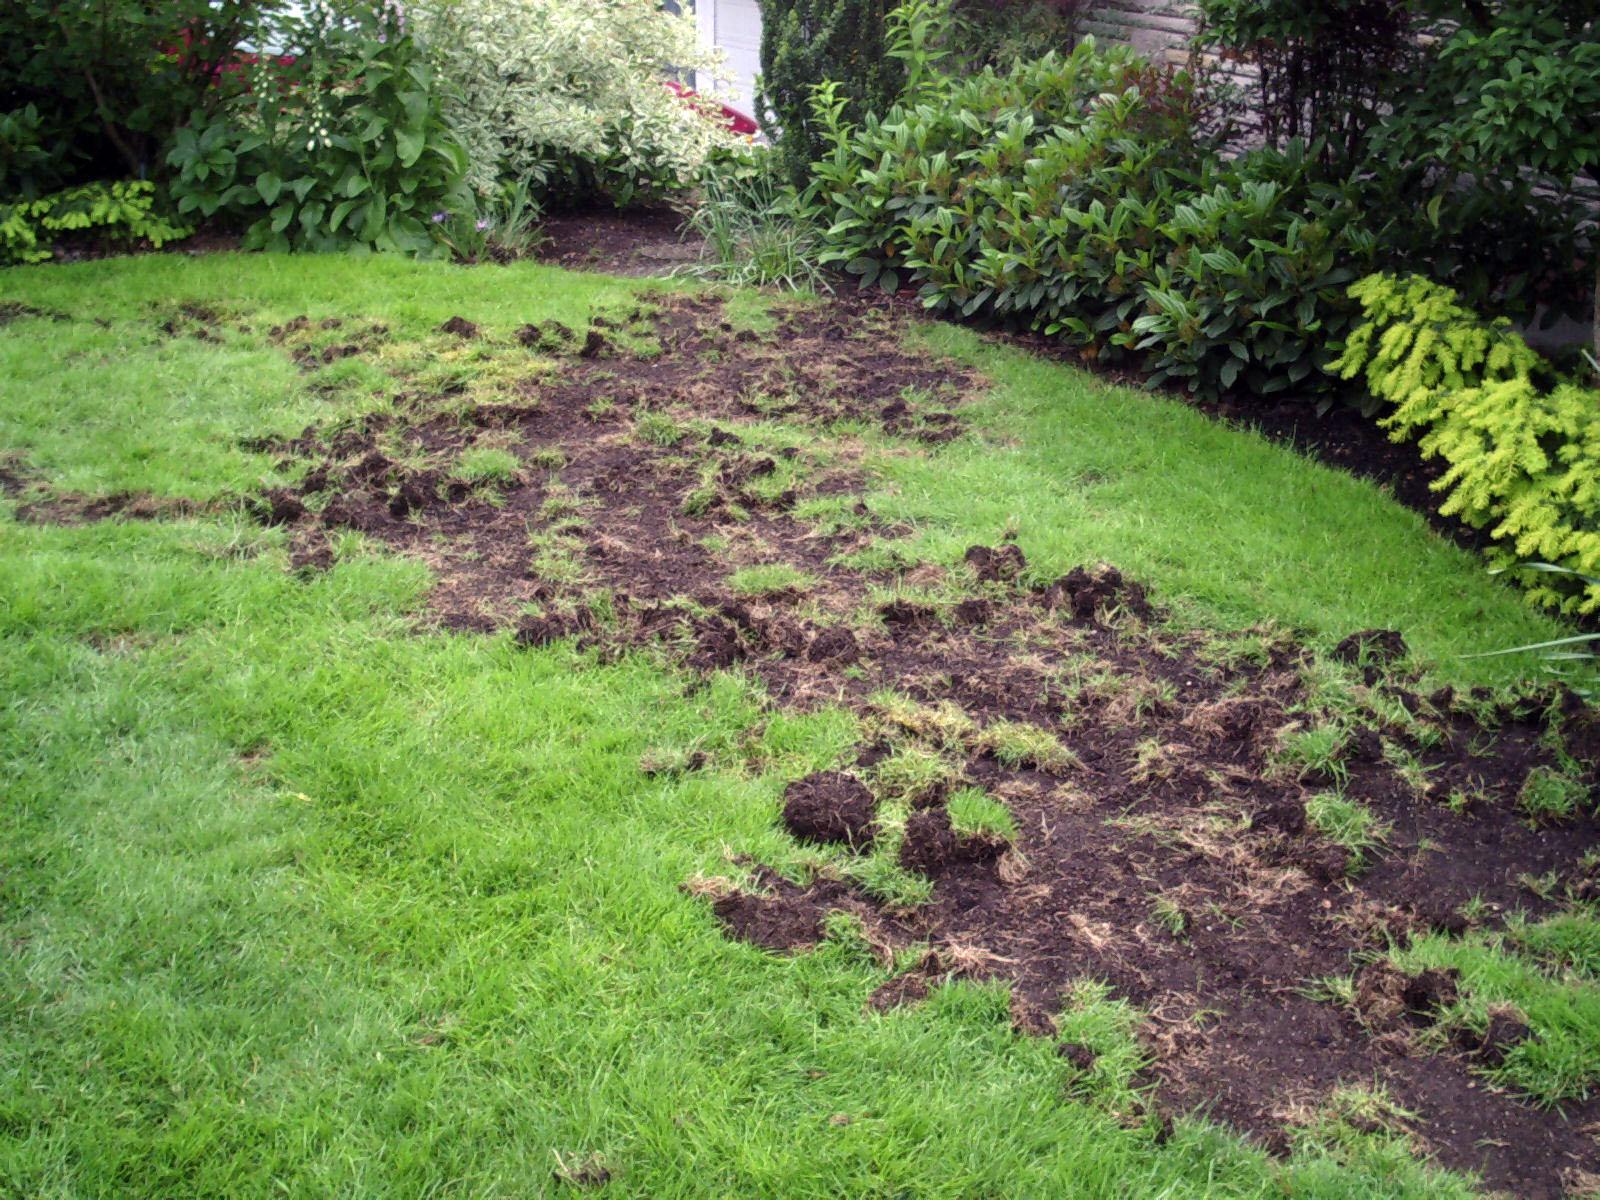 Racoon Lawn Damage